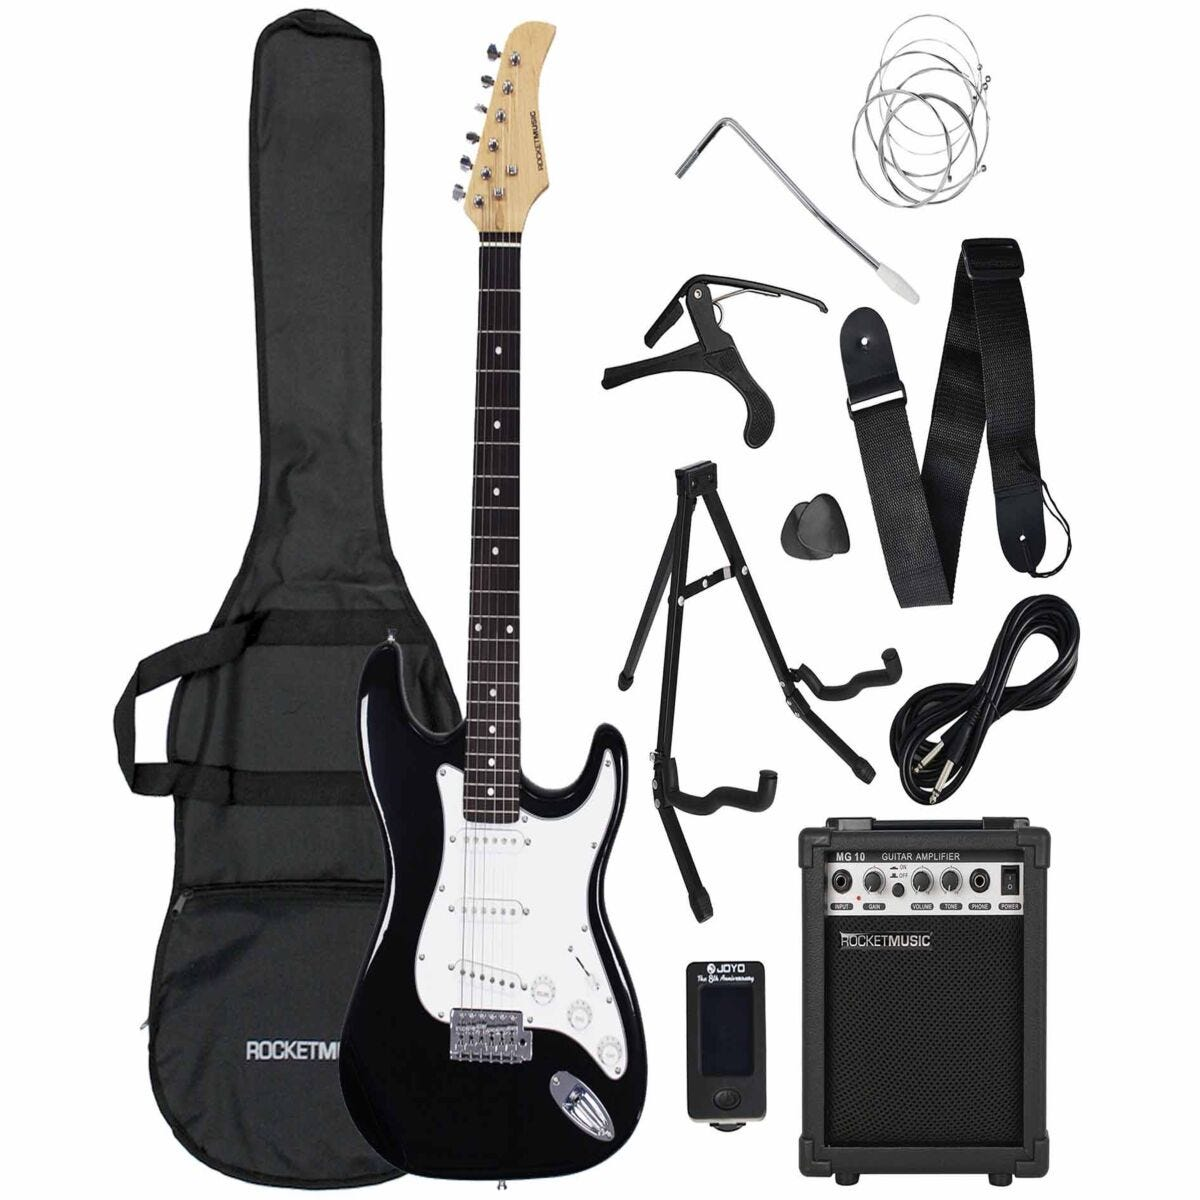 Rocket Full Size Electric Guitar Starter Kit